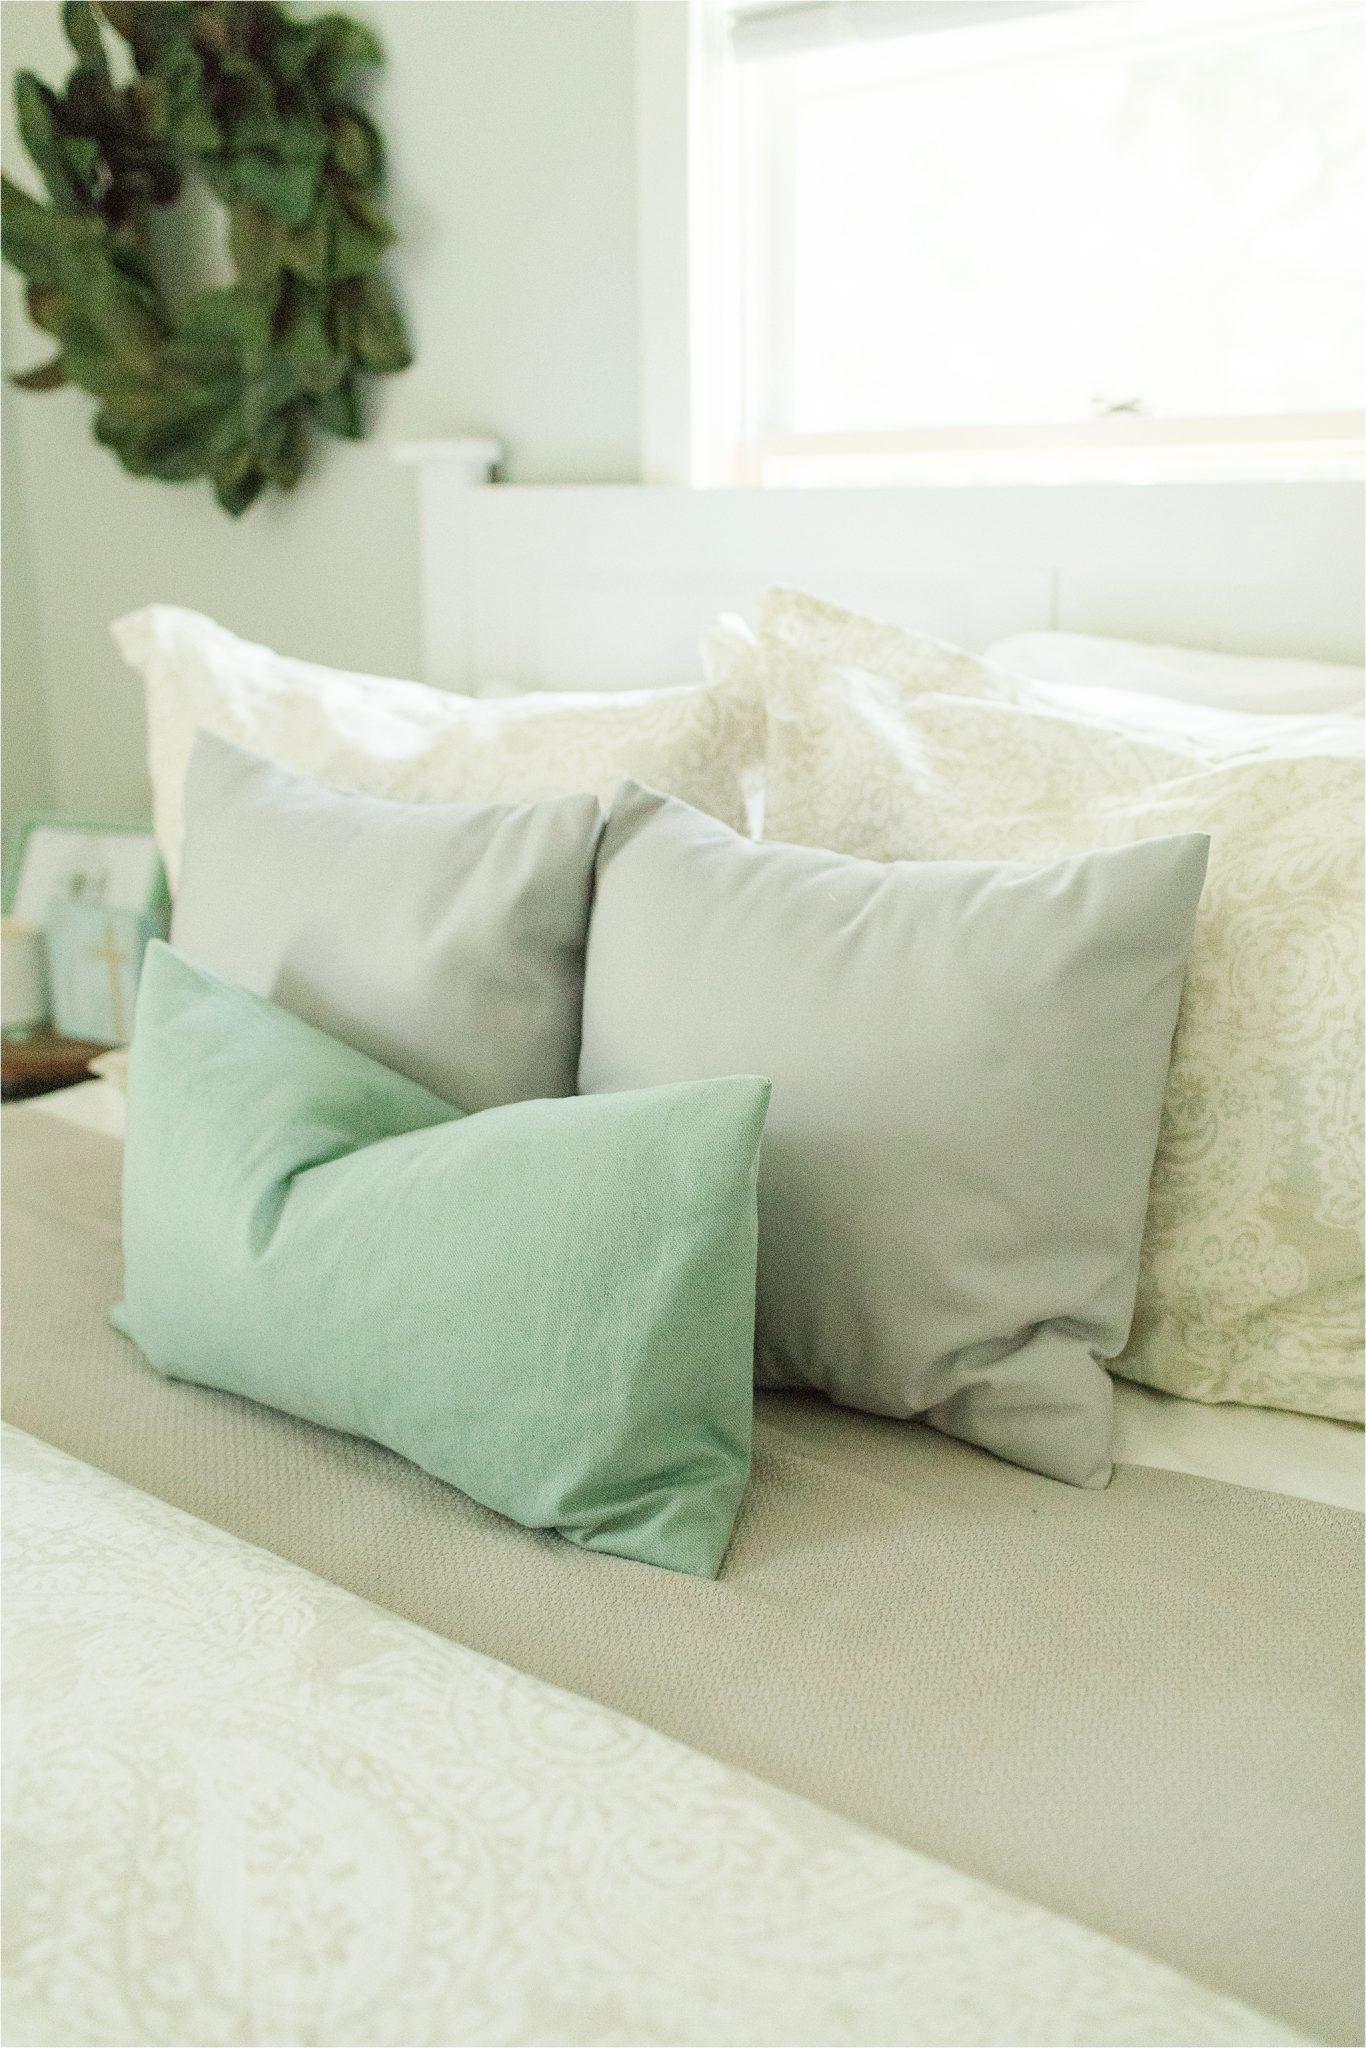 throw pillows and bedding midtown mobile